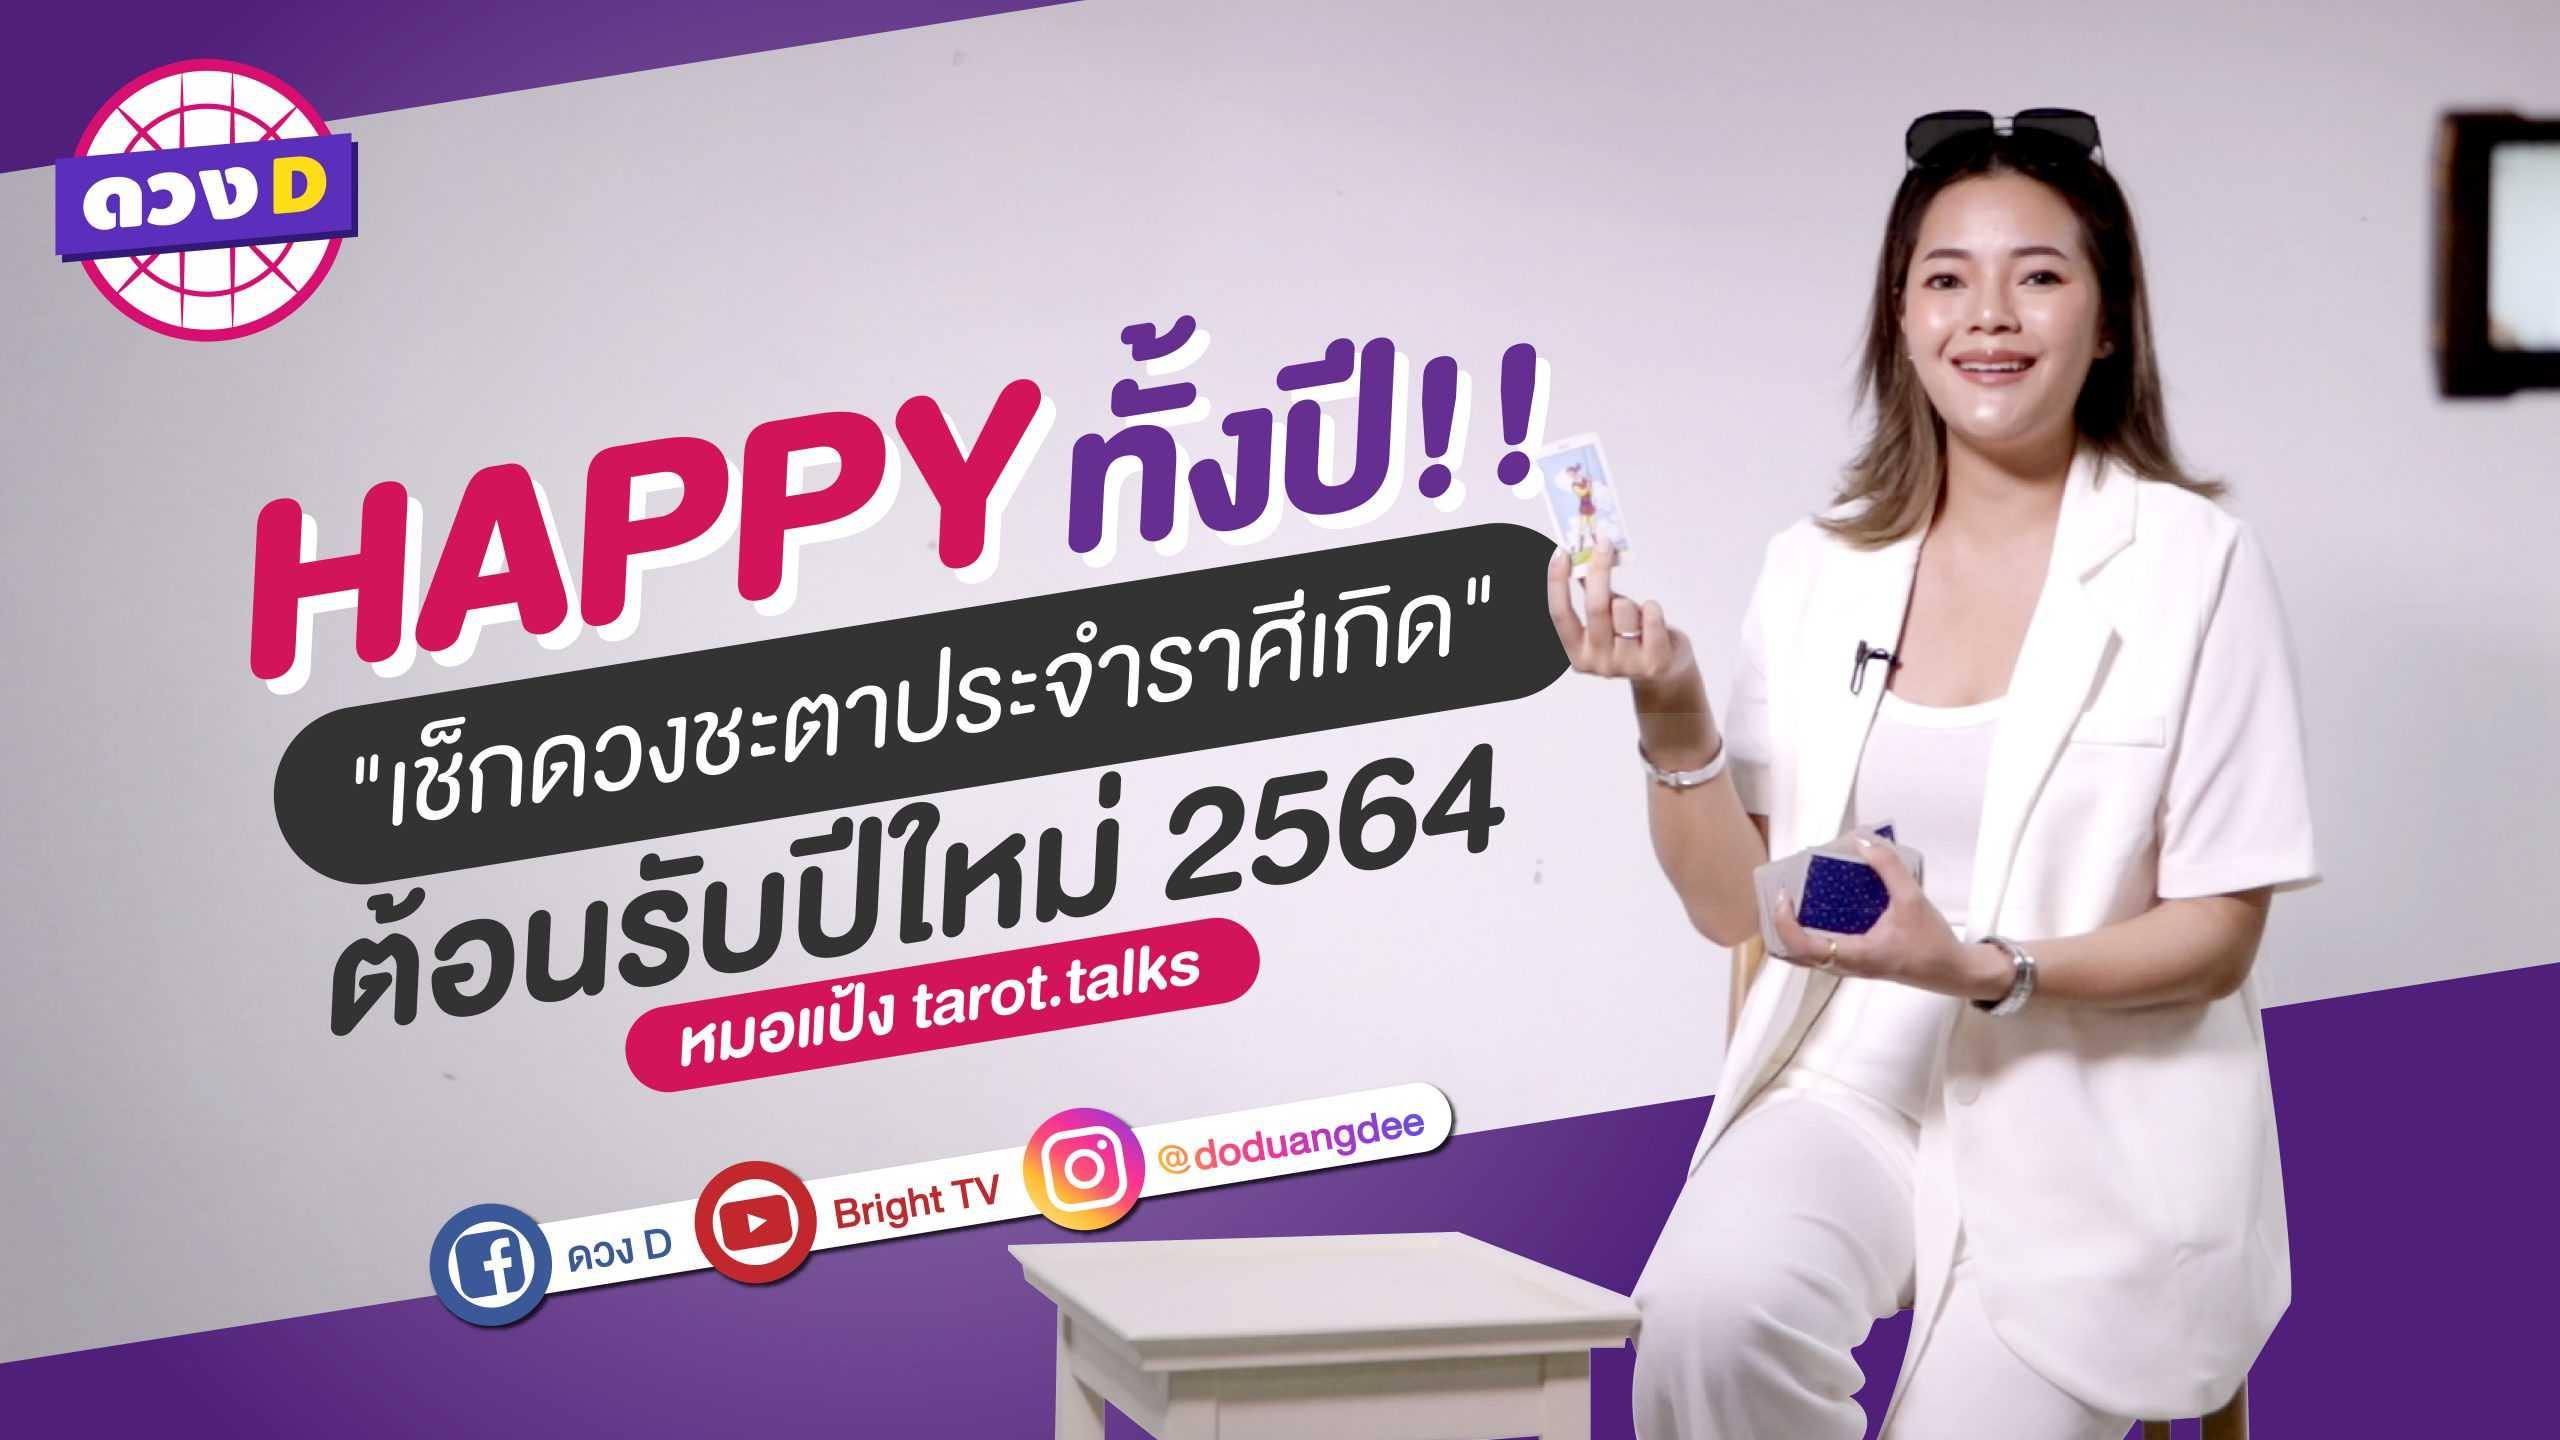 "HAPPY ทั้งปี!! ""เช็กดวงชะตาประจำราศีเกิด"" ต้อนรับปีใหม่ 2564 (ดวงD X หมอแป้ง tarot.talks)"